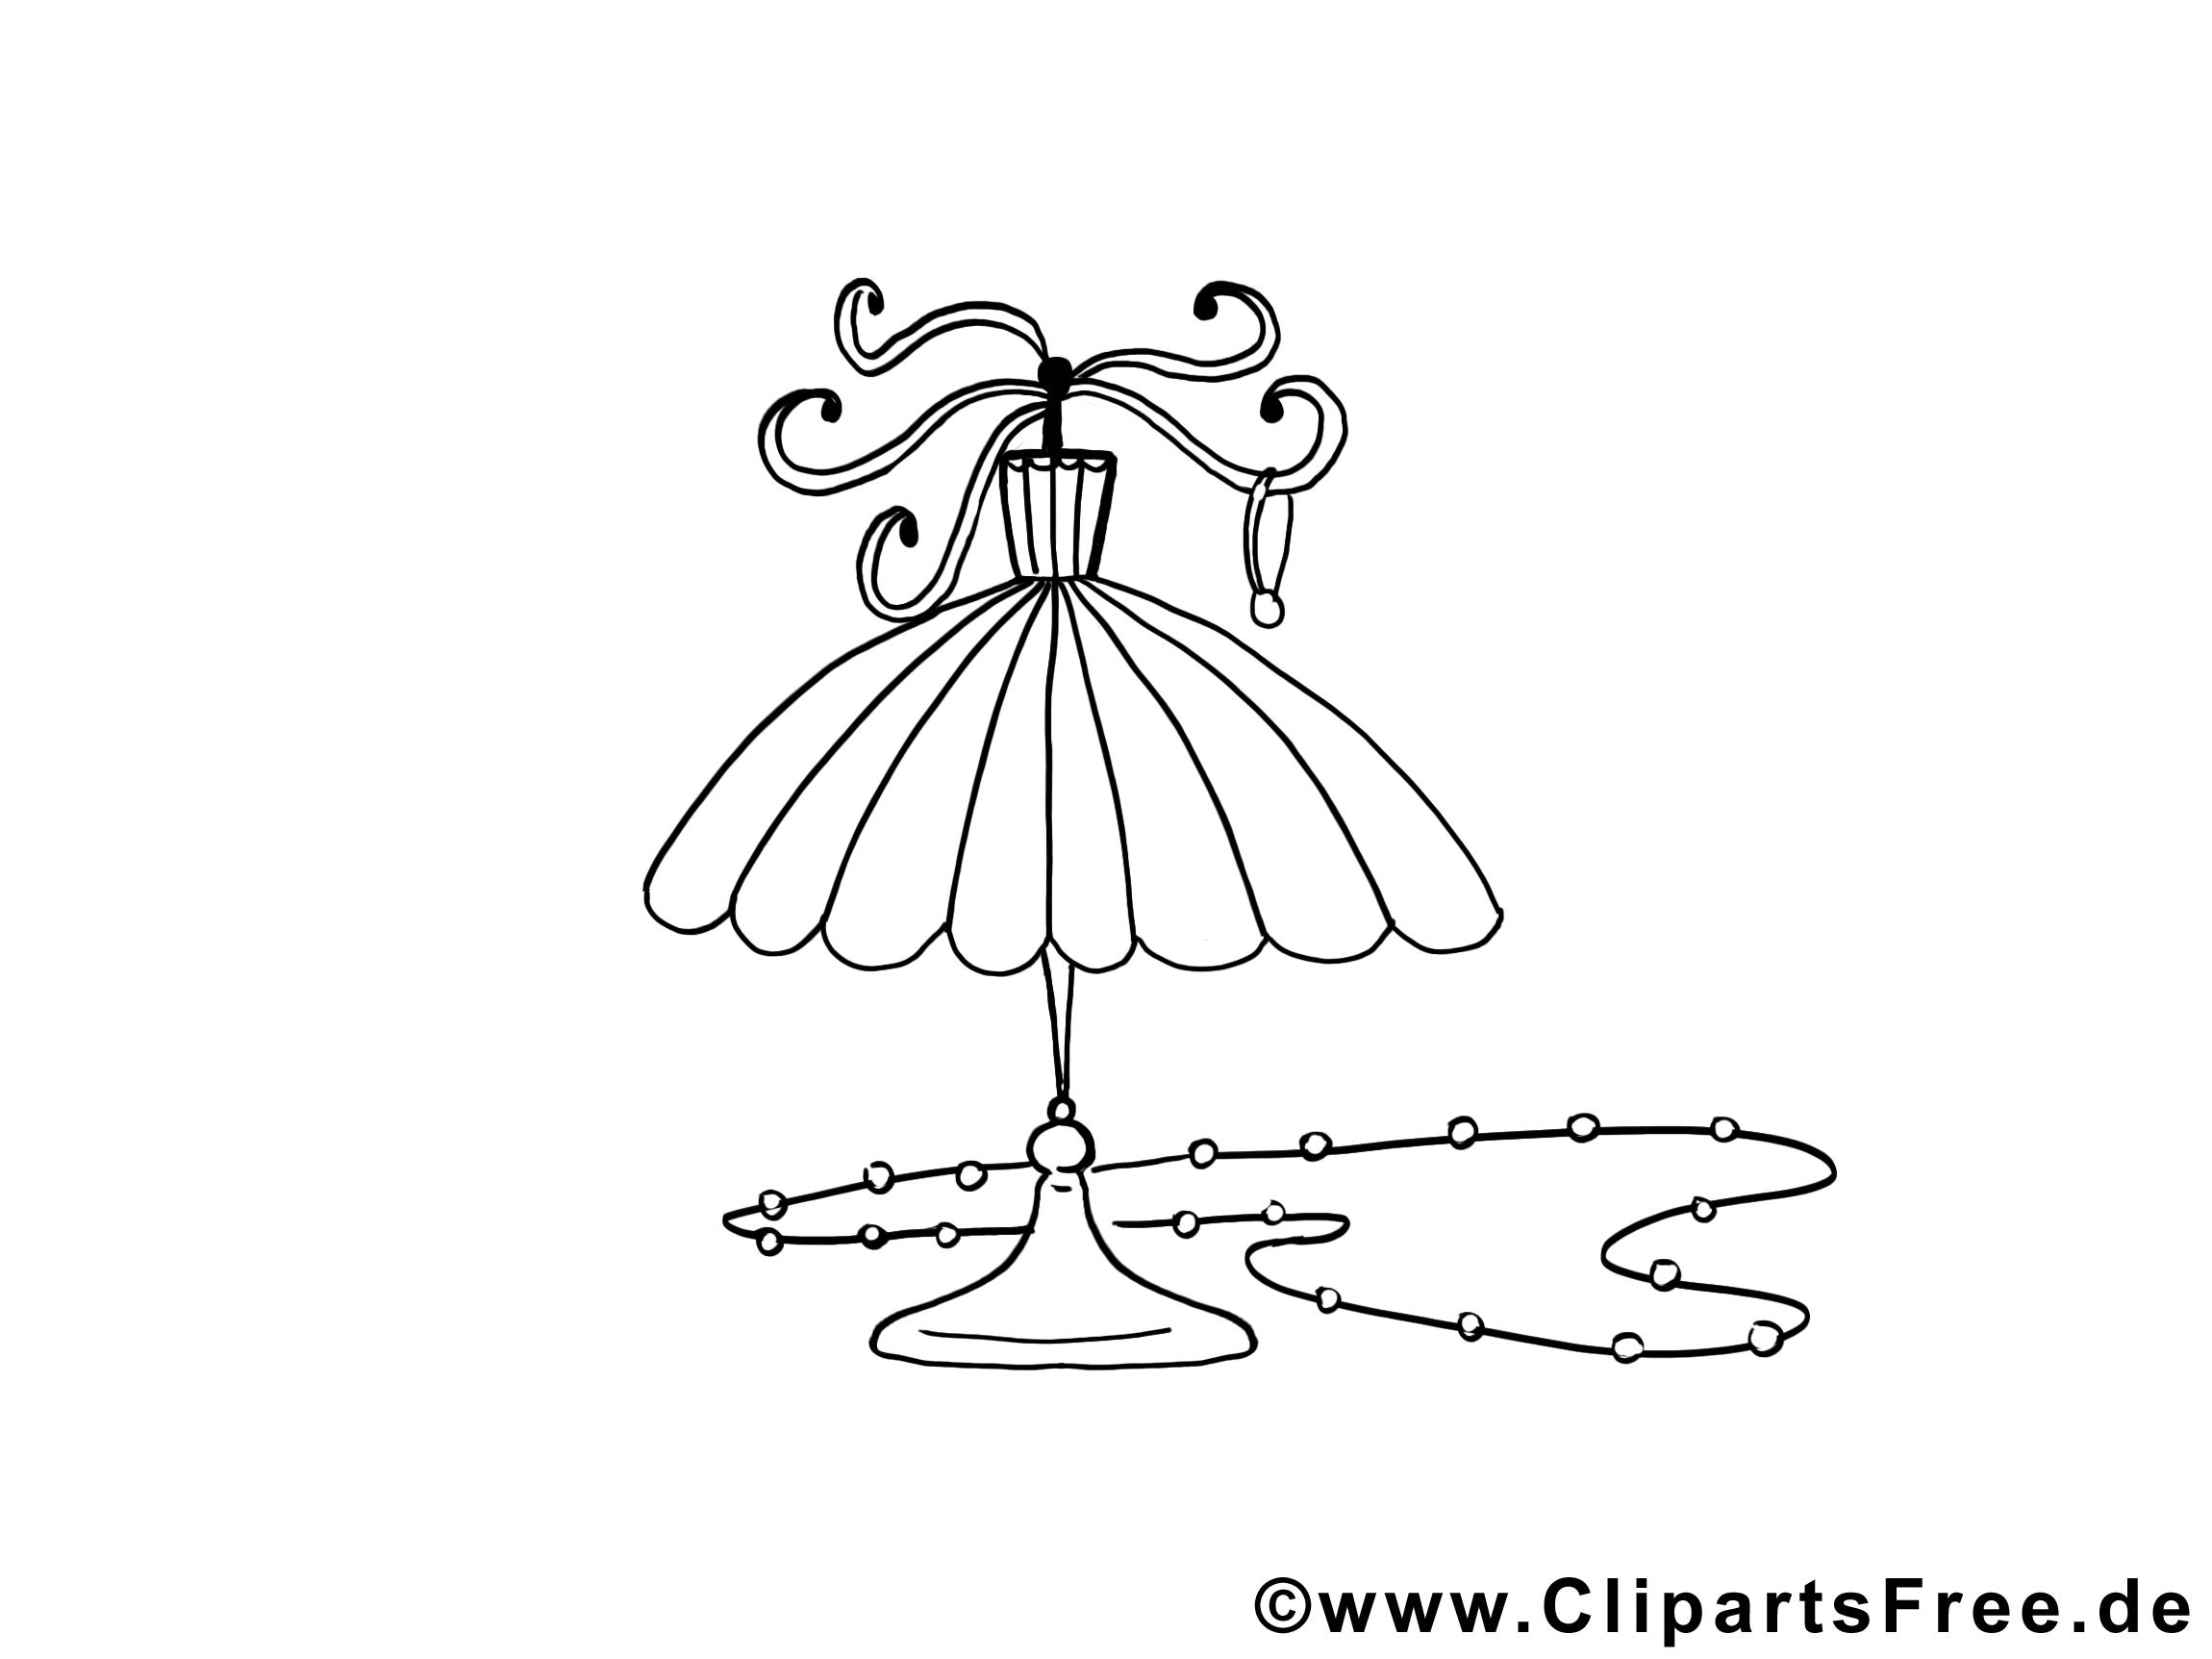 Lampe illustration – Coloriage divers cliparts